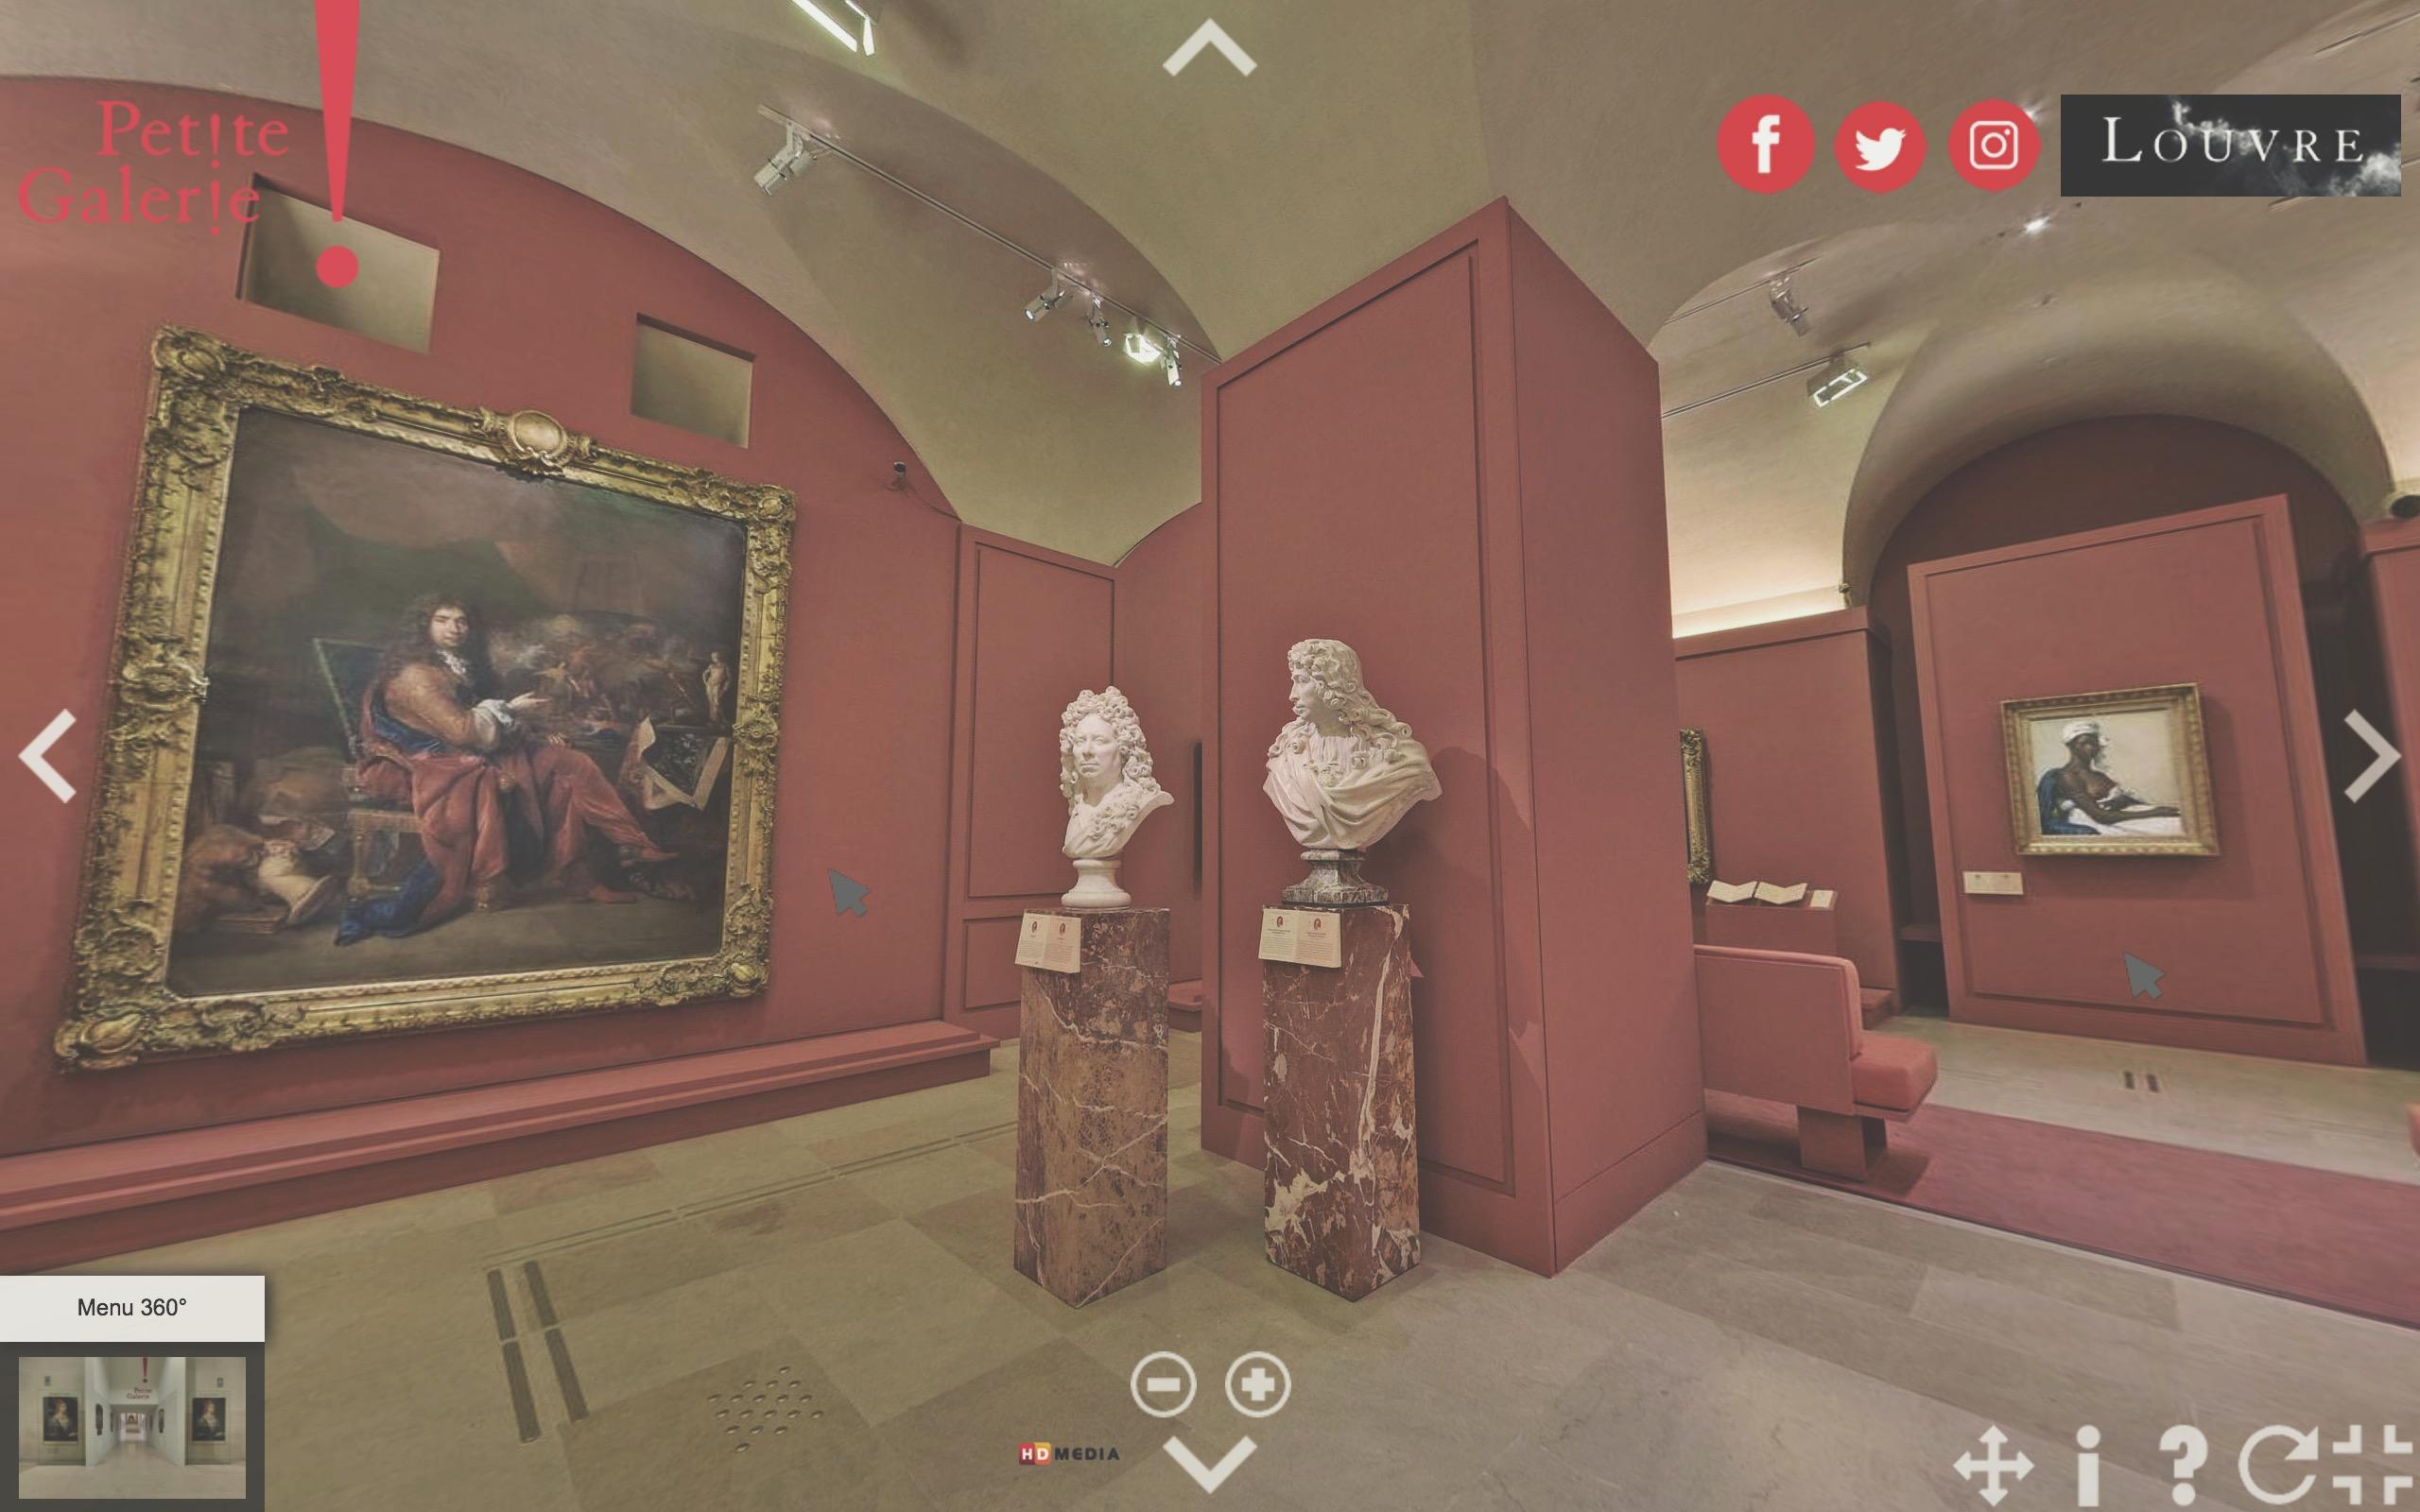 virtual tour louvre museum petite galerie